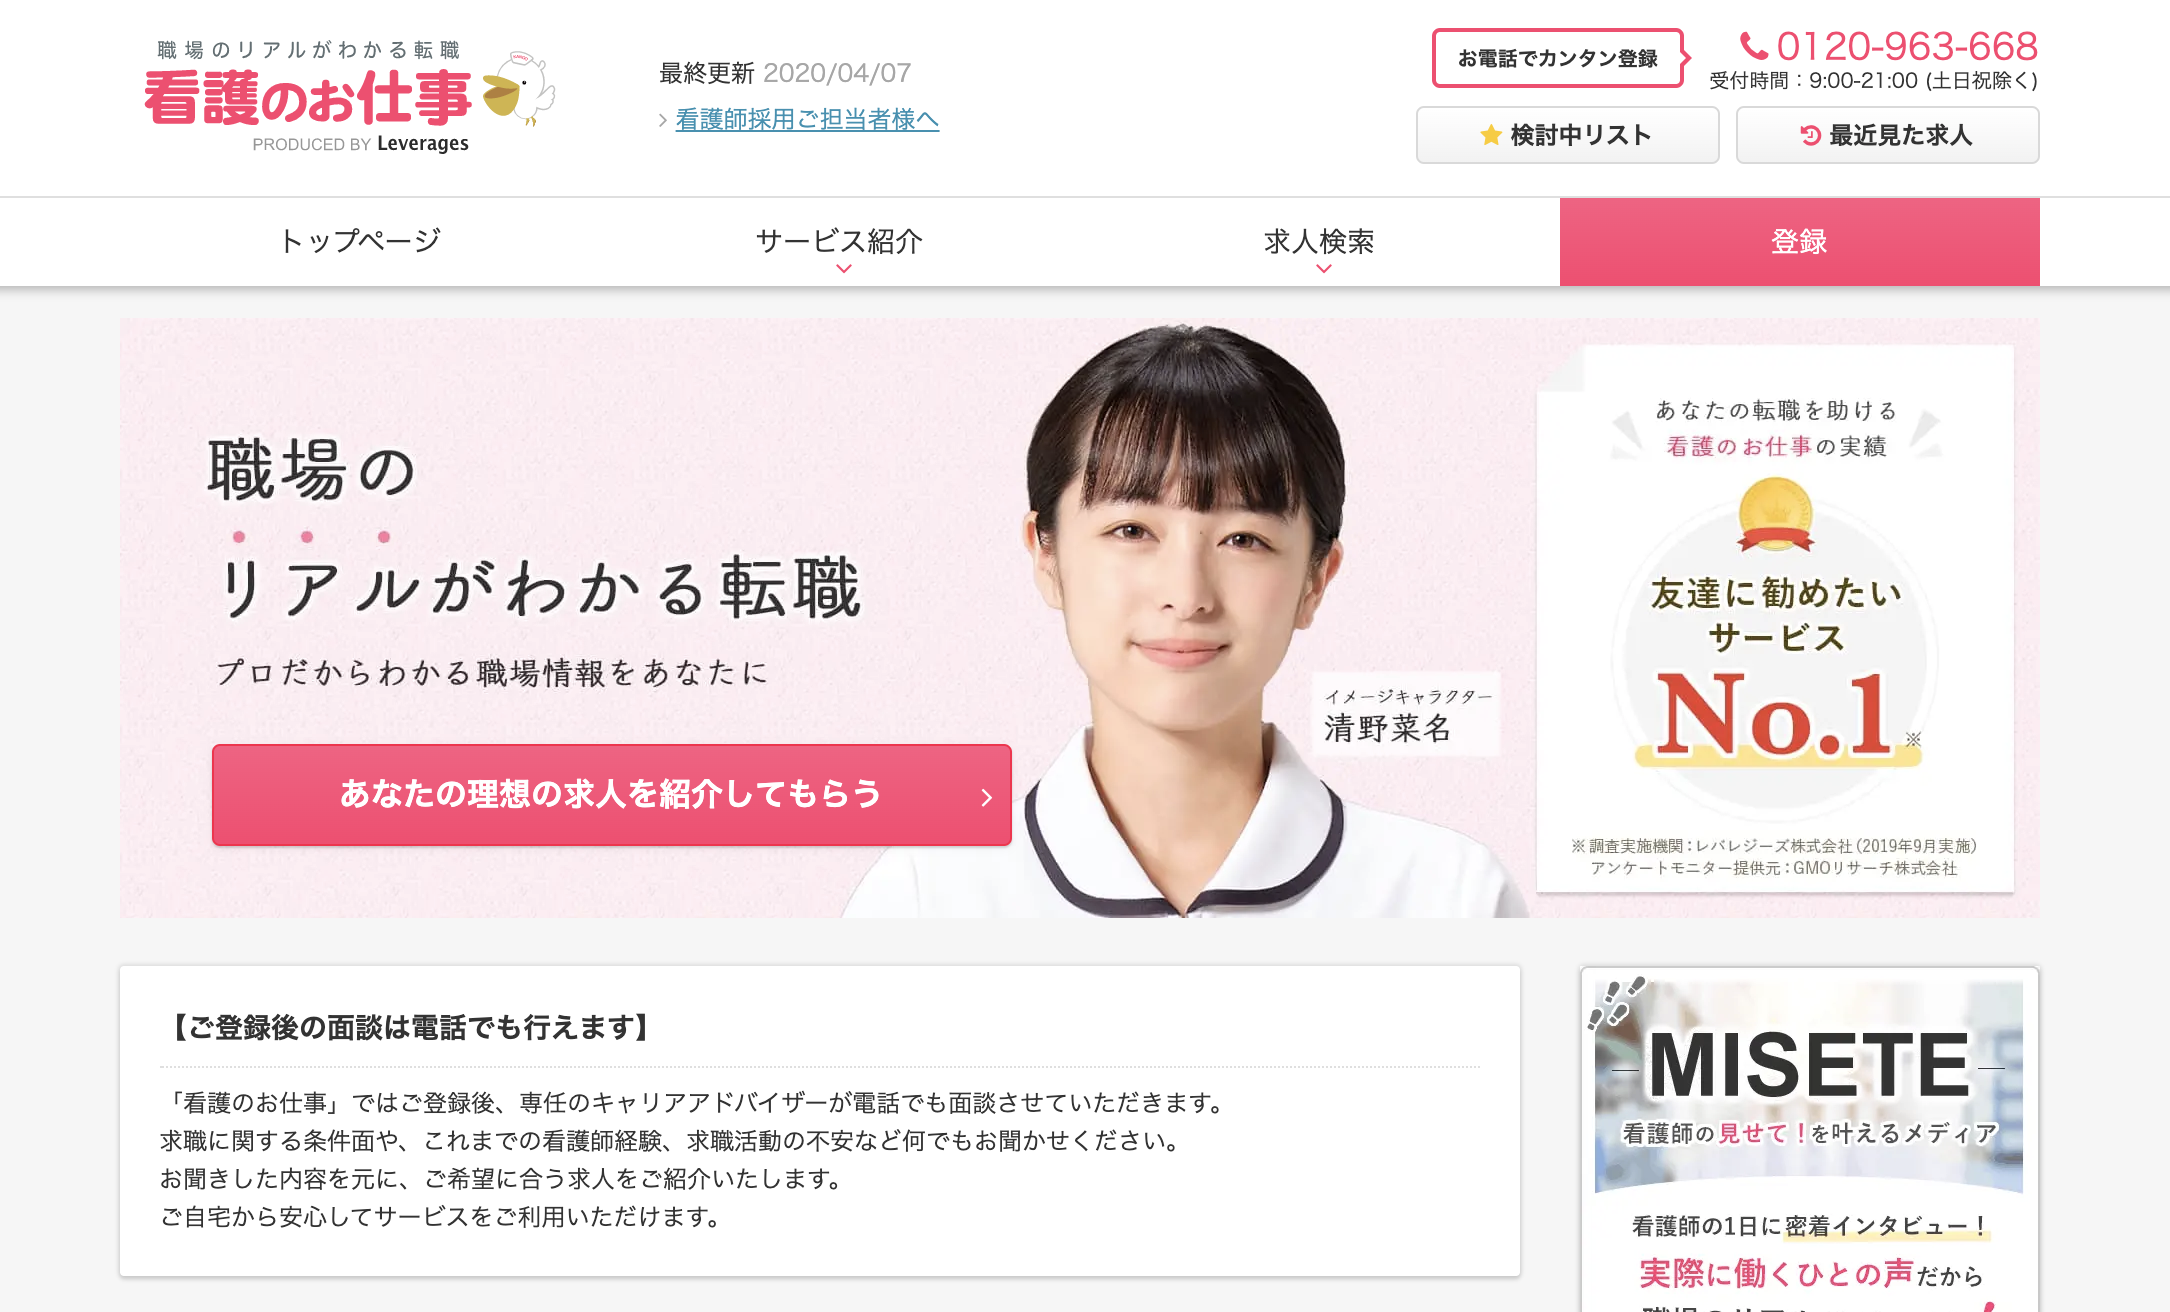 nurse-change-of-job-ranking11